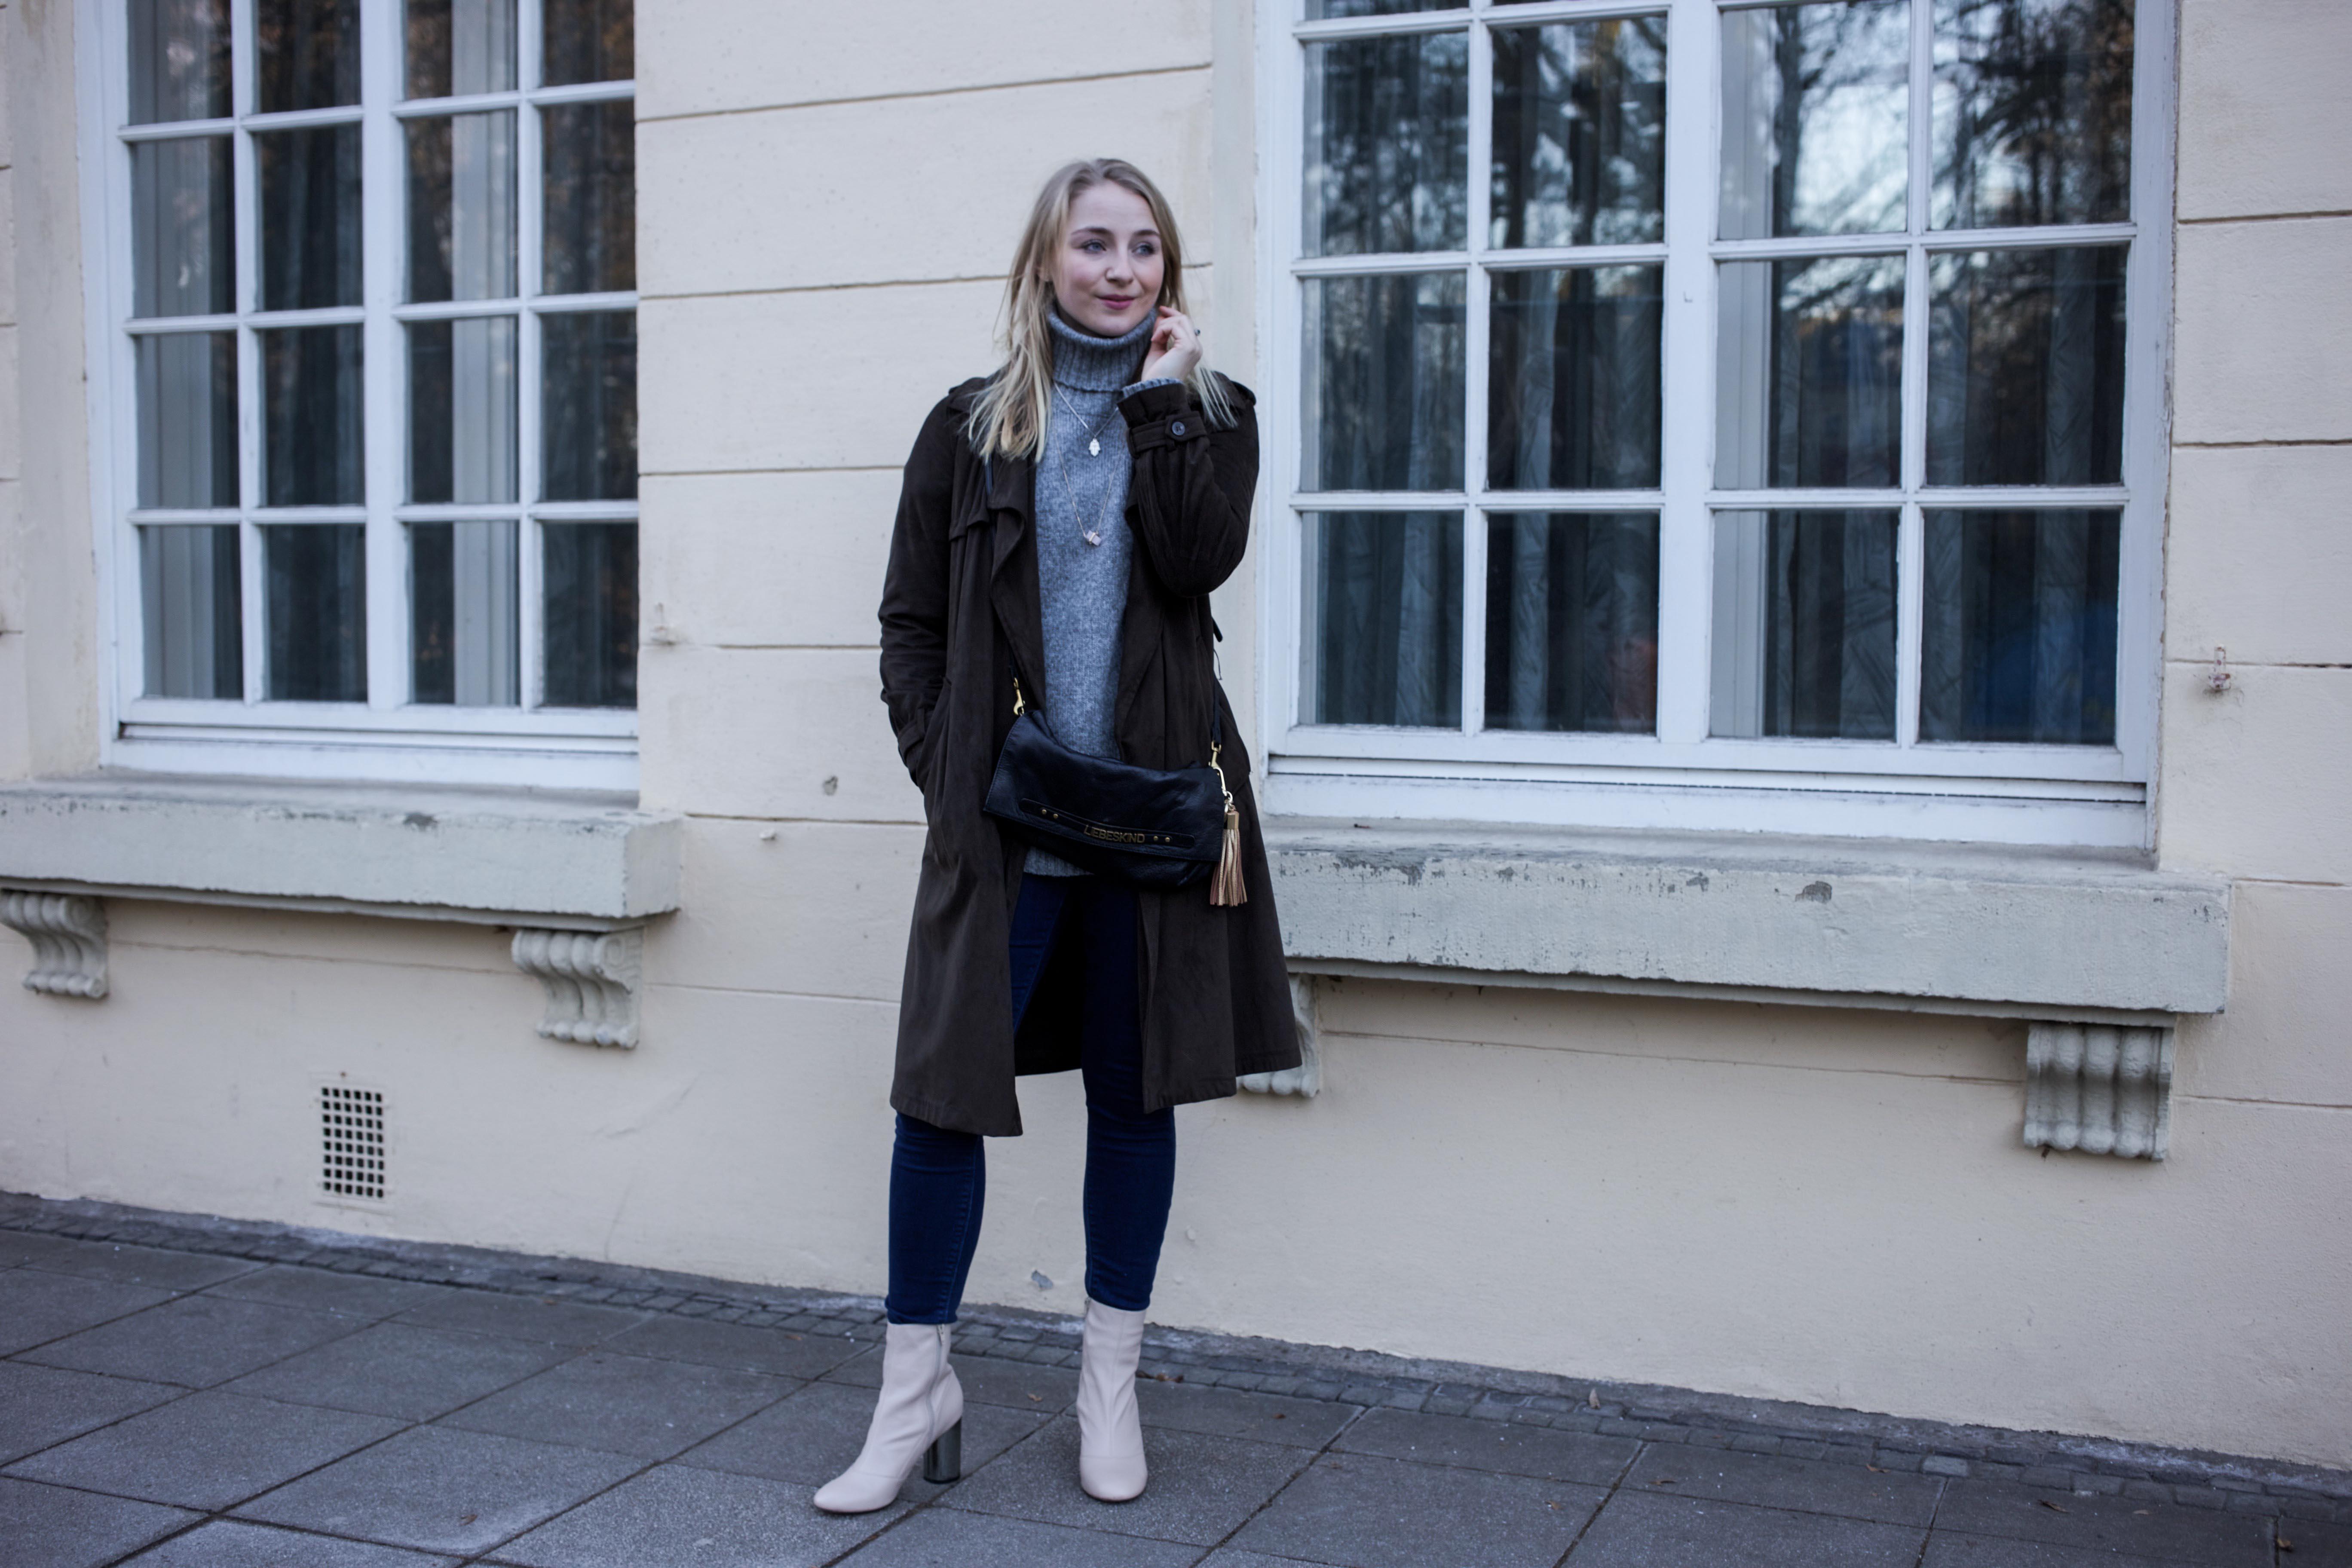 turtleneck-trench-coat-streetstyle-modeblog-fashionblog-bonn-berlin-köln-lederstiefel-silberabsatz-outfit_9202